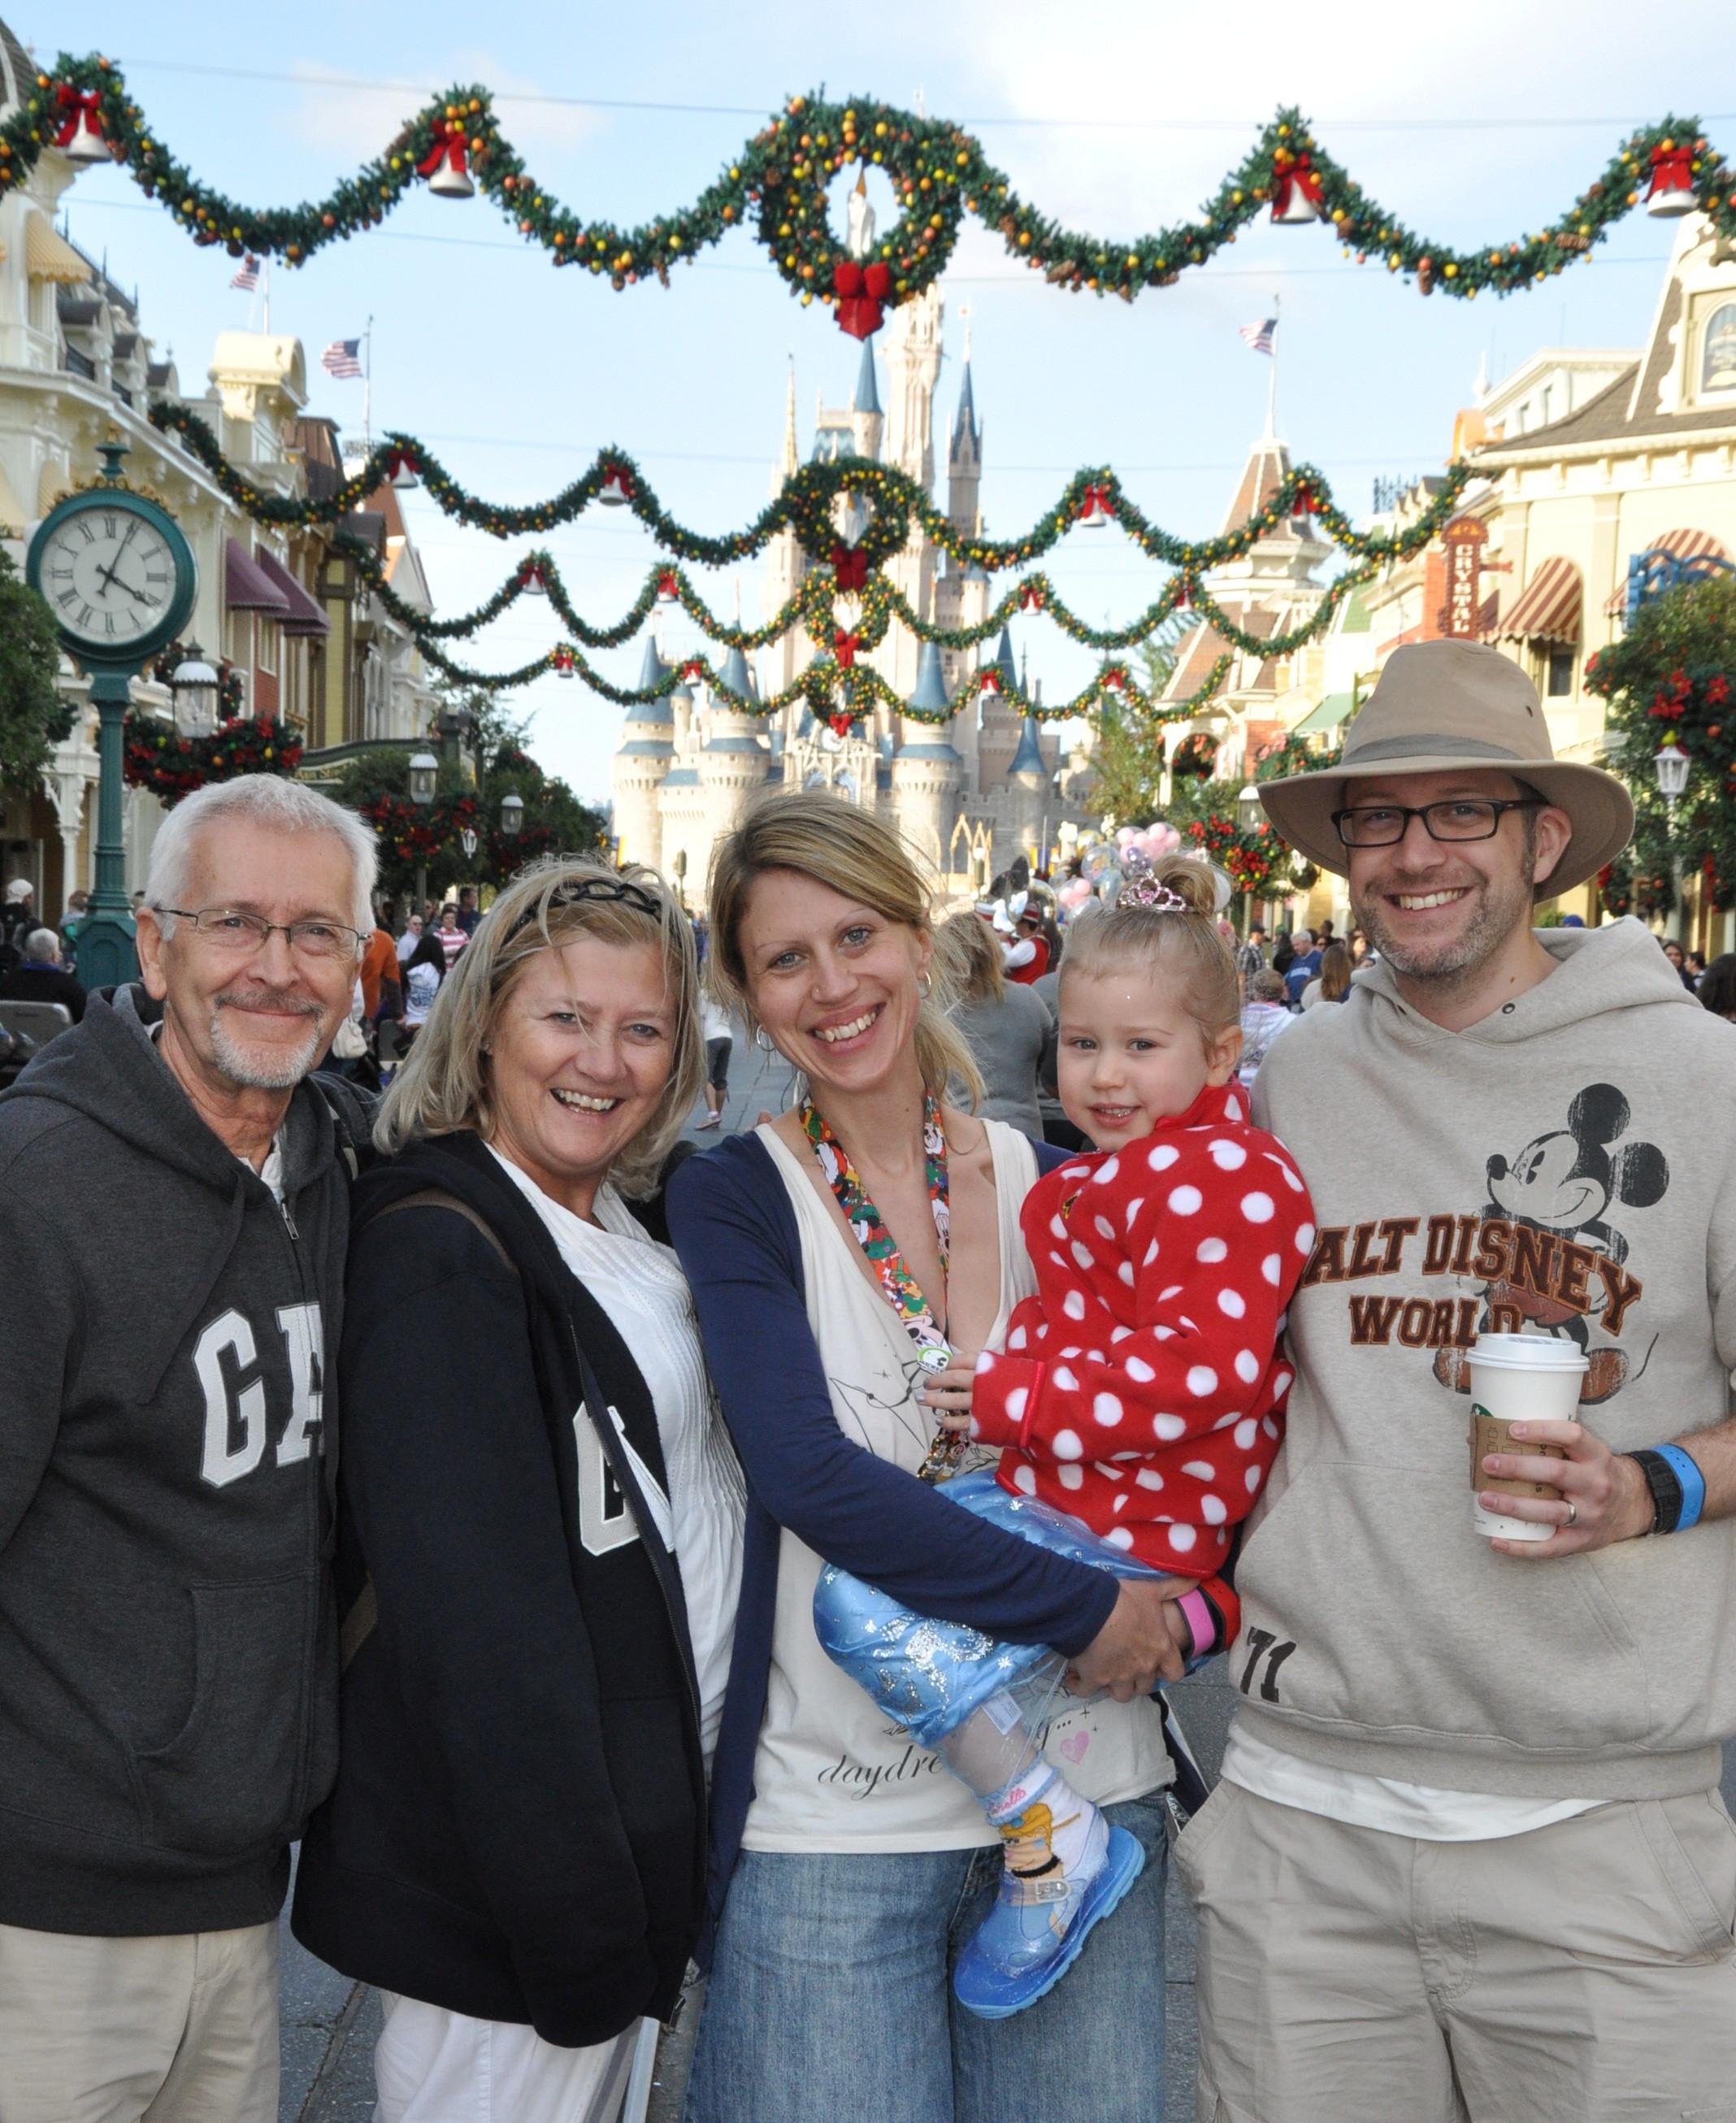 Disney World Family photo at Christmas